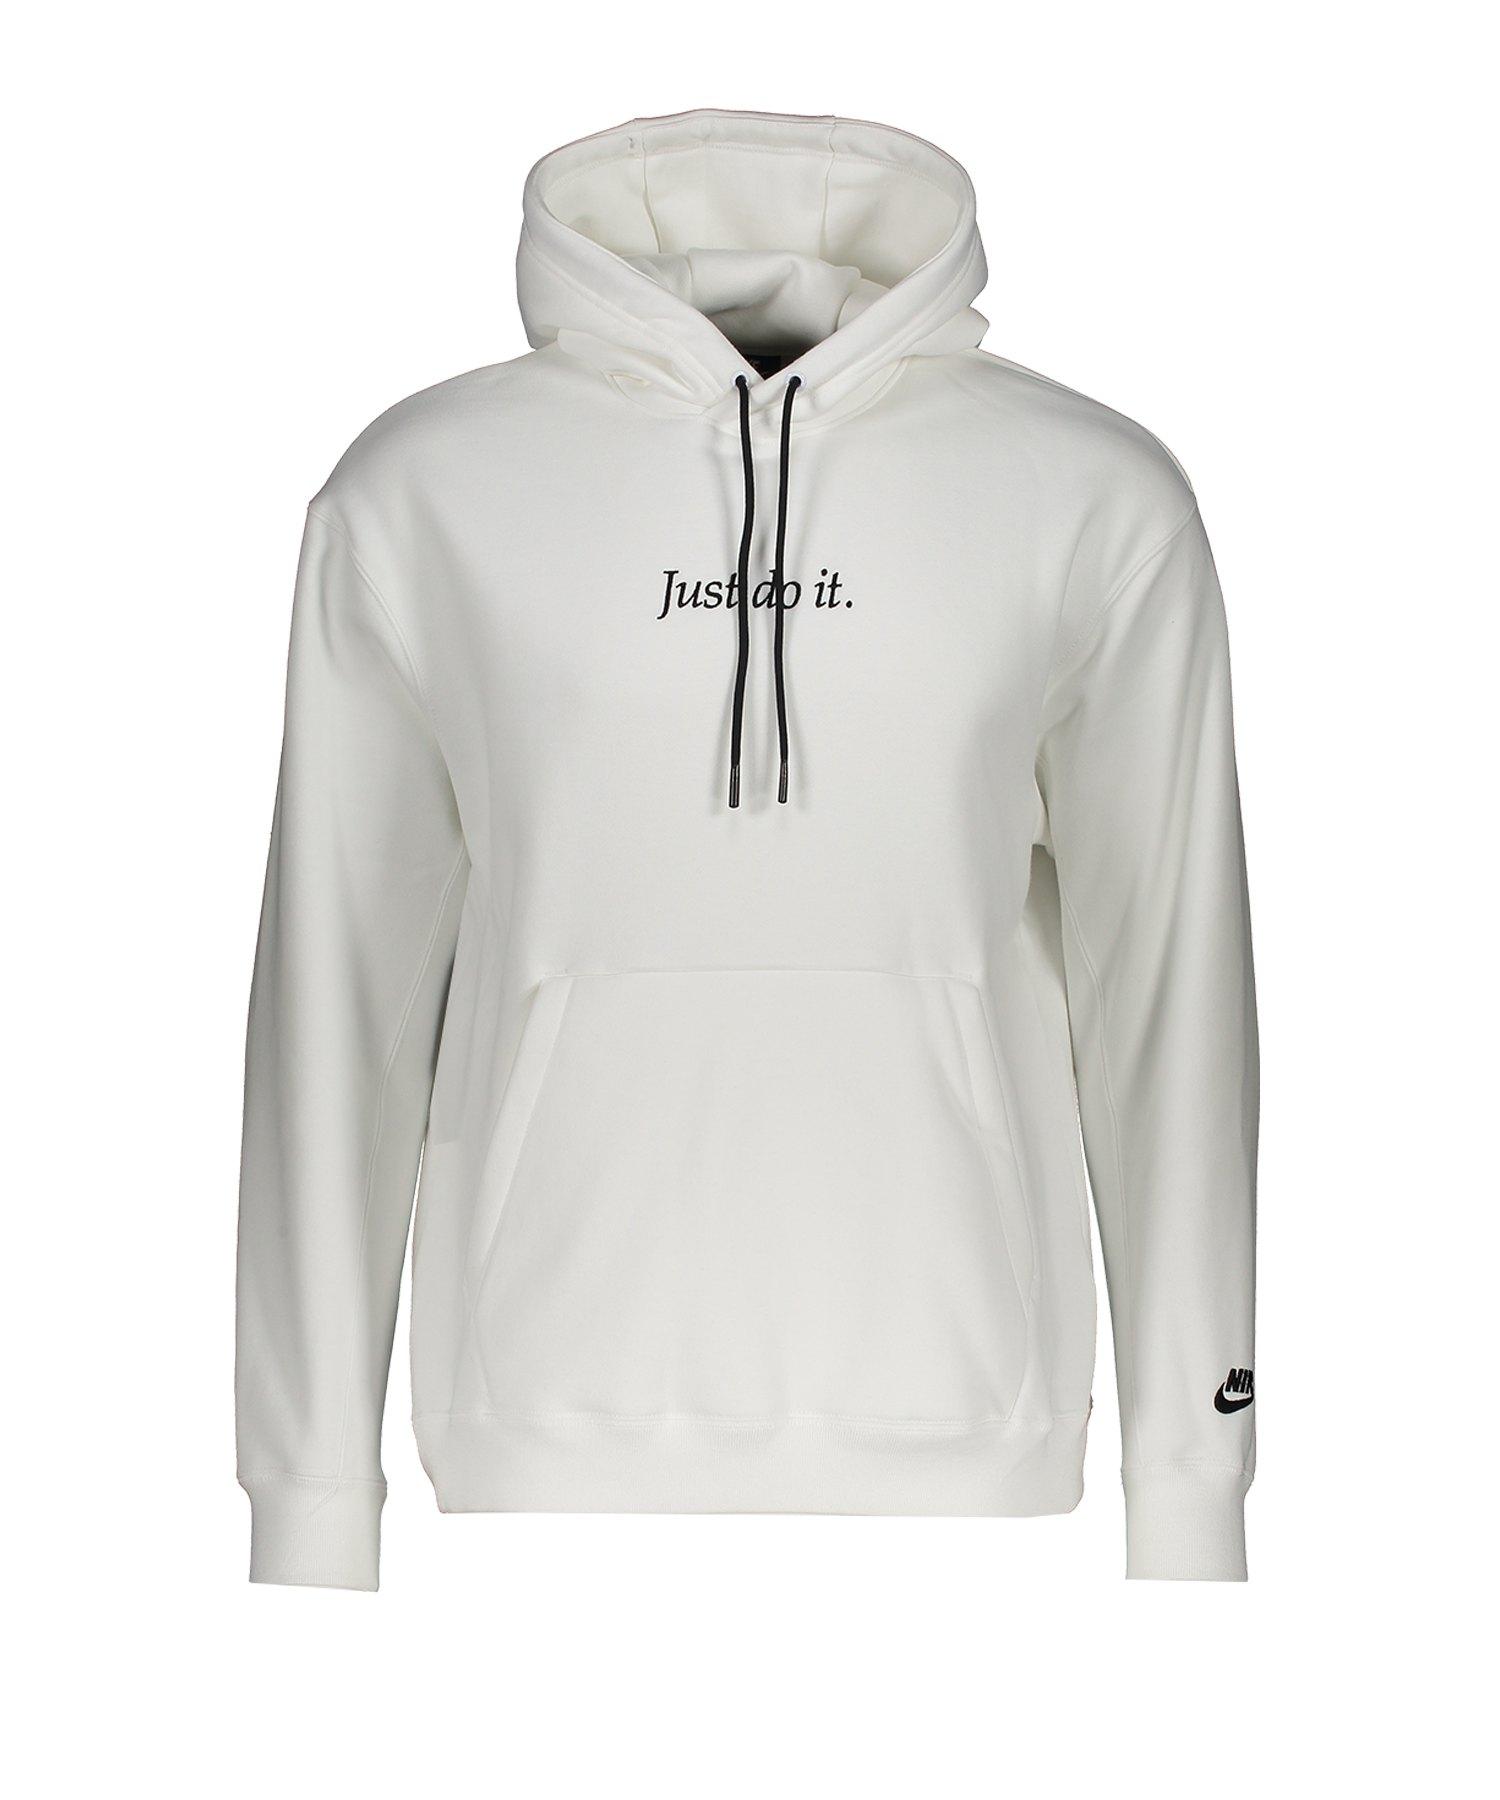 Nike JDI Fleece Kapuzenpullover Weiss F100 - weiss